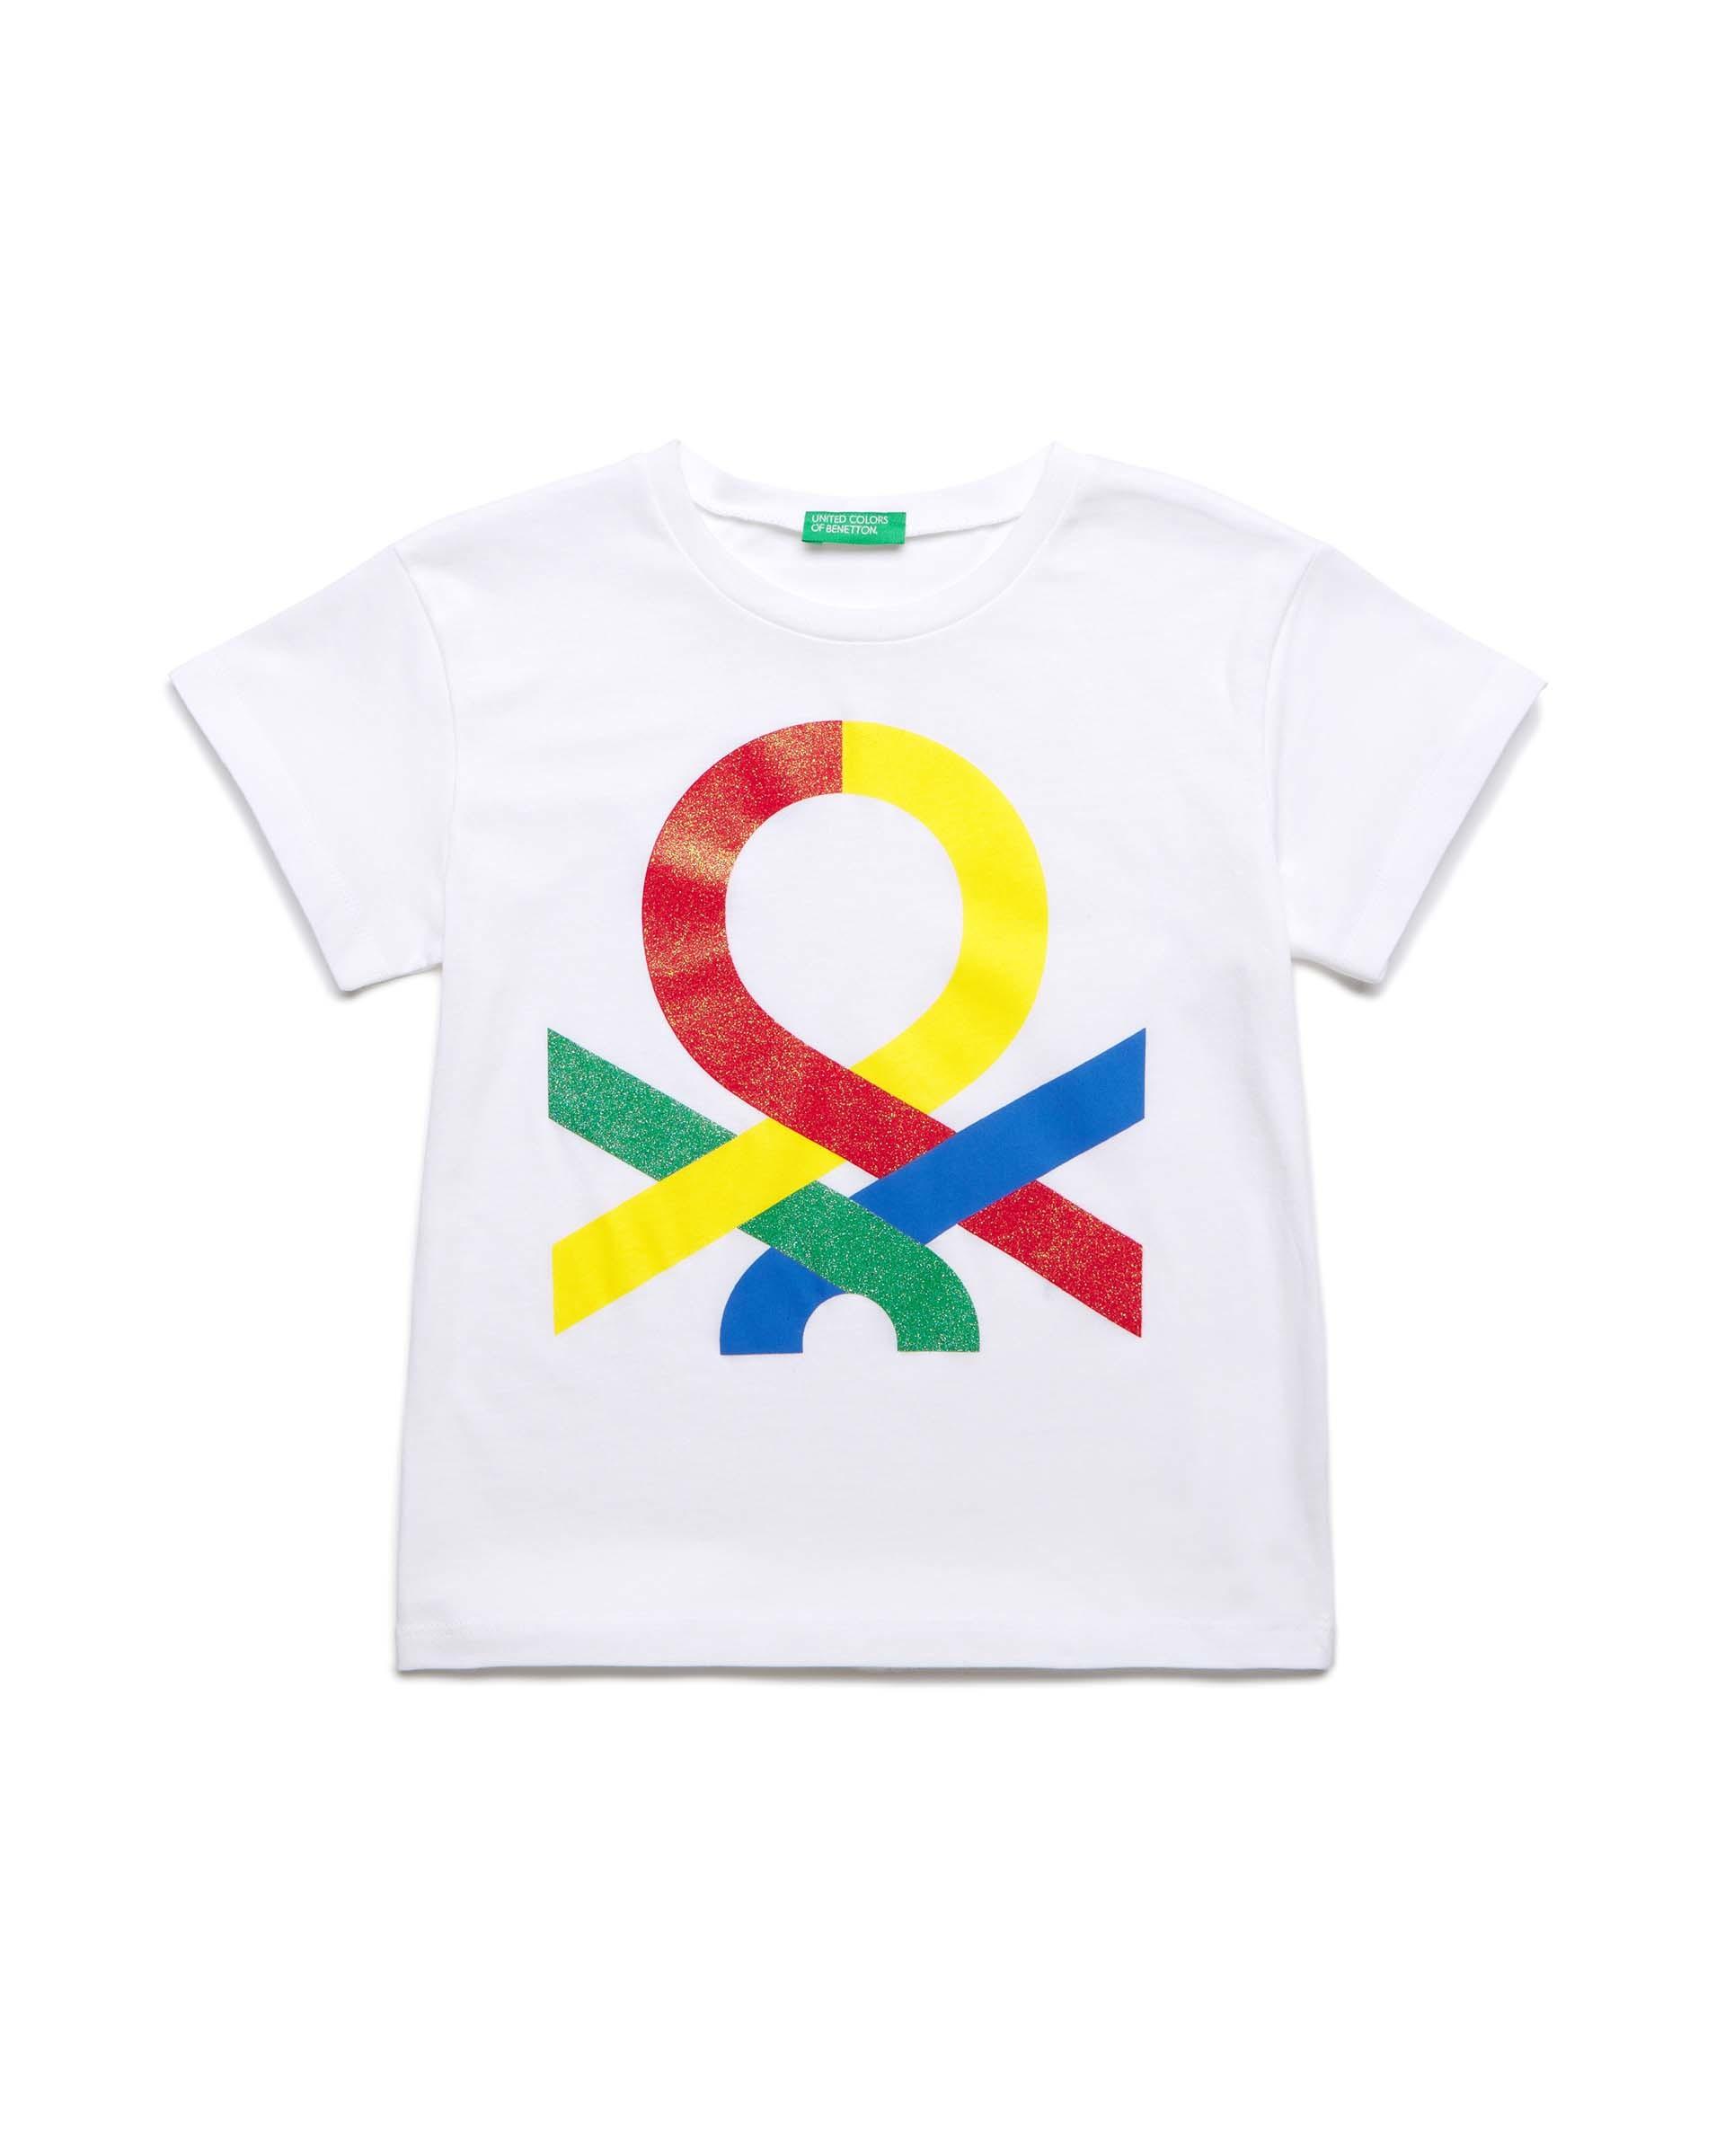 Купить 20P_3I1XC14JT_901, Футболка для девочек Benetton 3I1XC14JT_901 р-р 152, United Colors of Benetton, Футболки для девочек